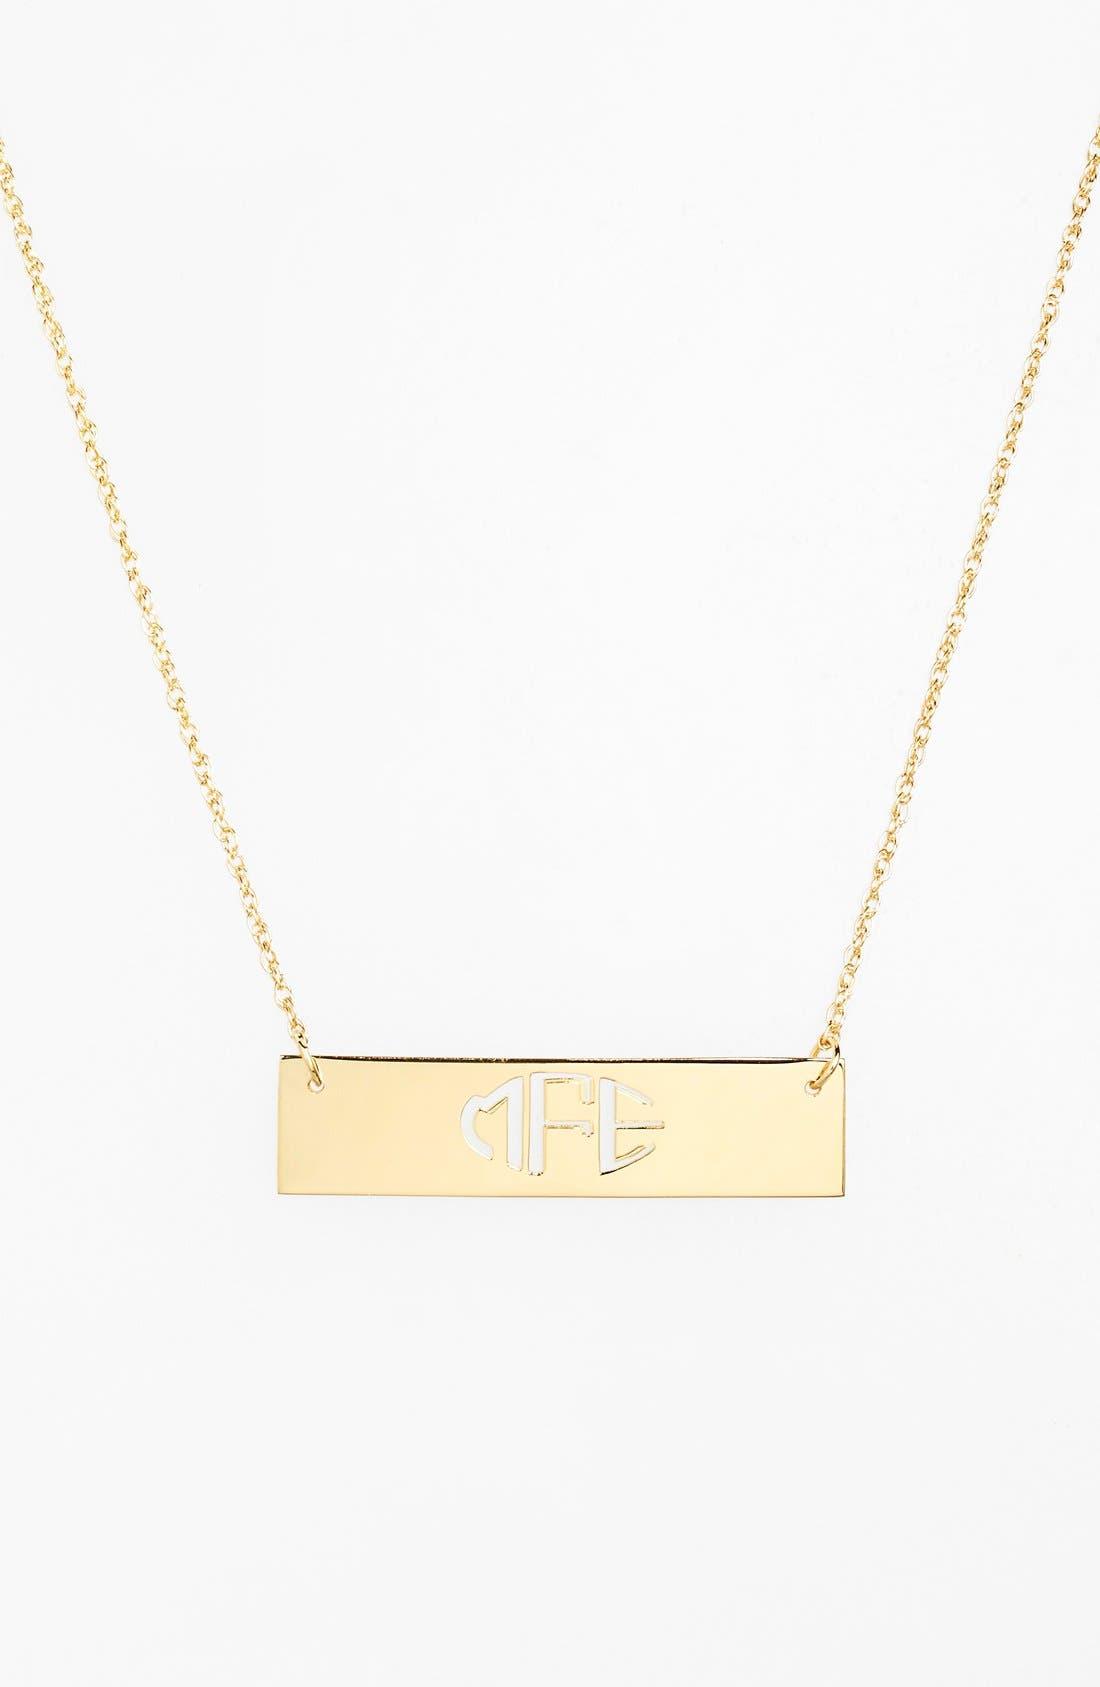 Personalized Cutout Bar Pendant Necklace,                         Main,                         color, Gold